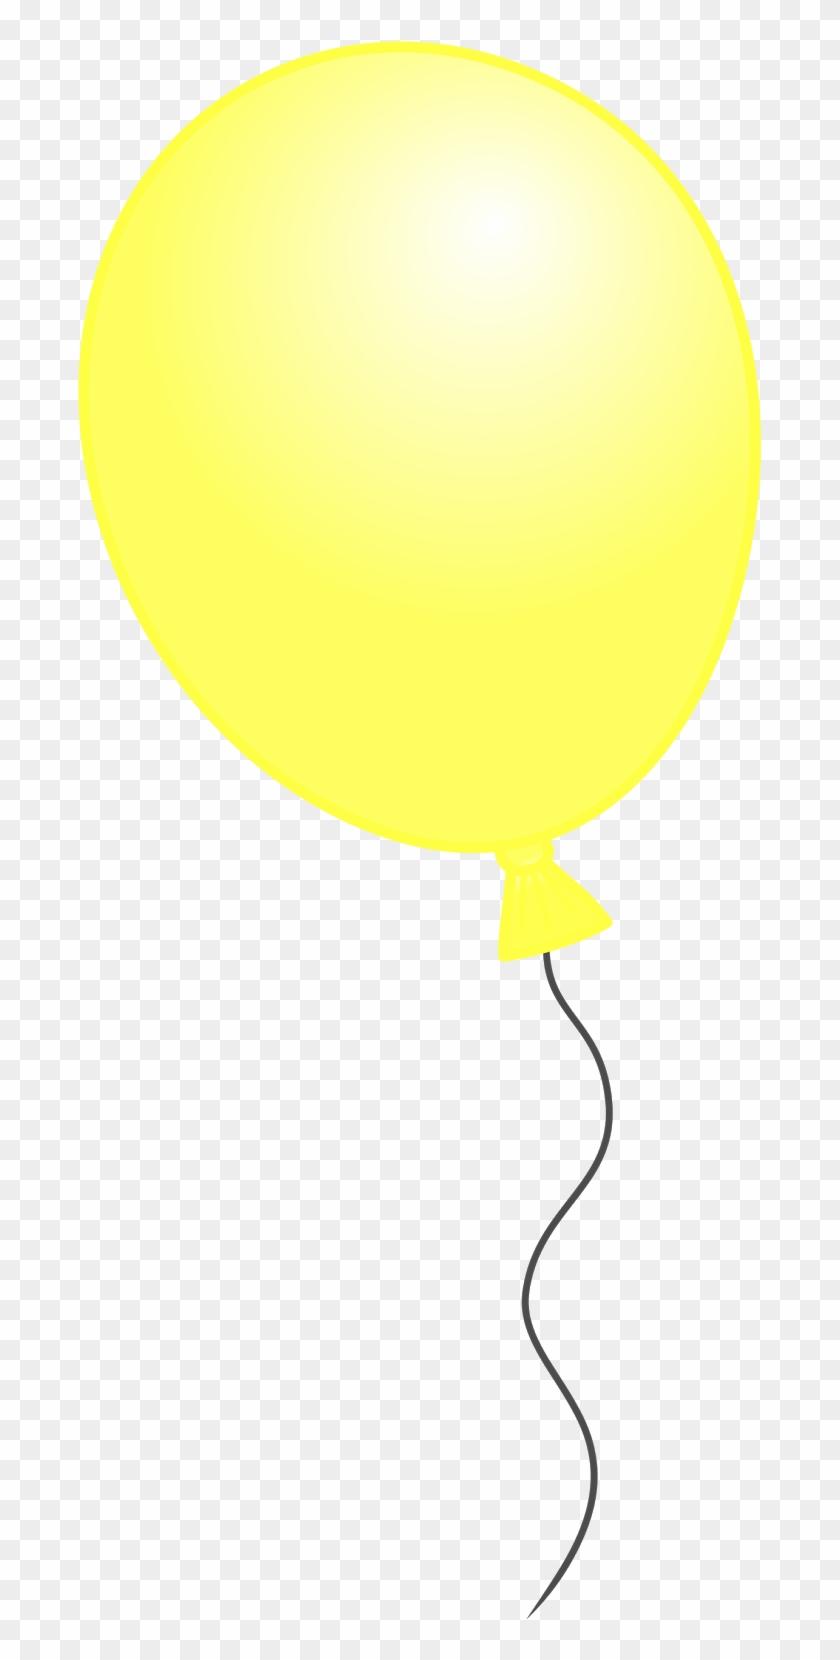 Yellow Balloon Clipart - Yellow Birthday Balloon Png #177828